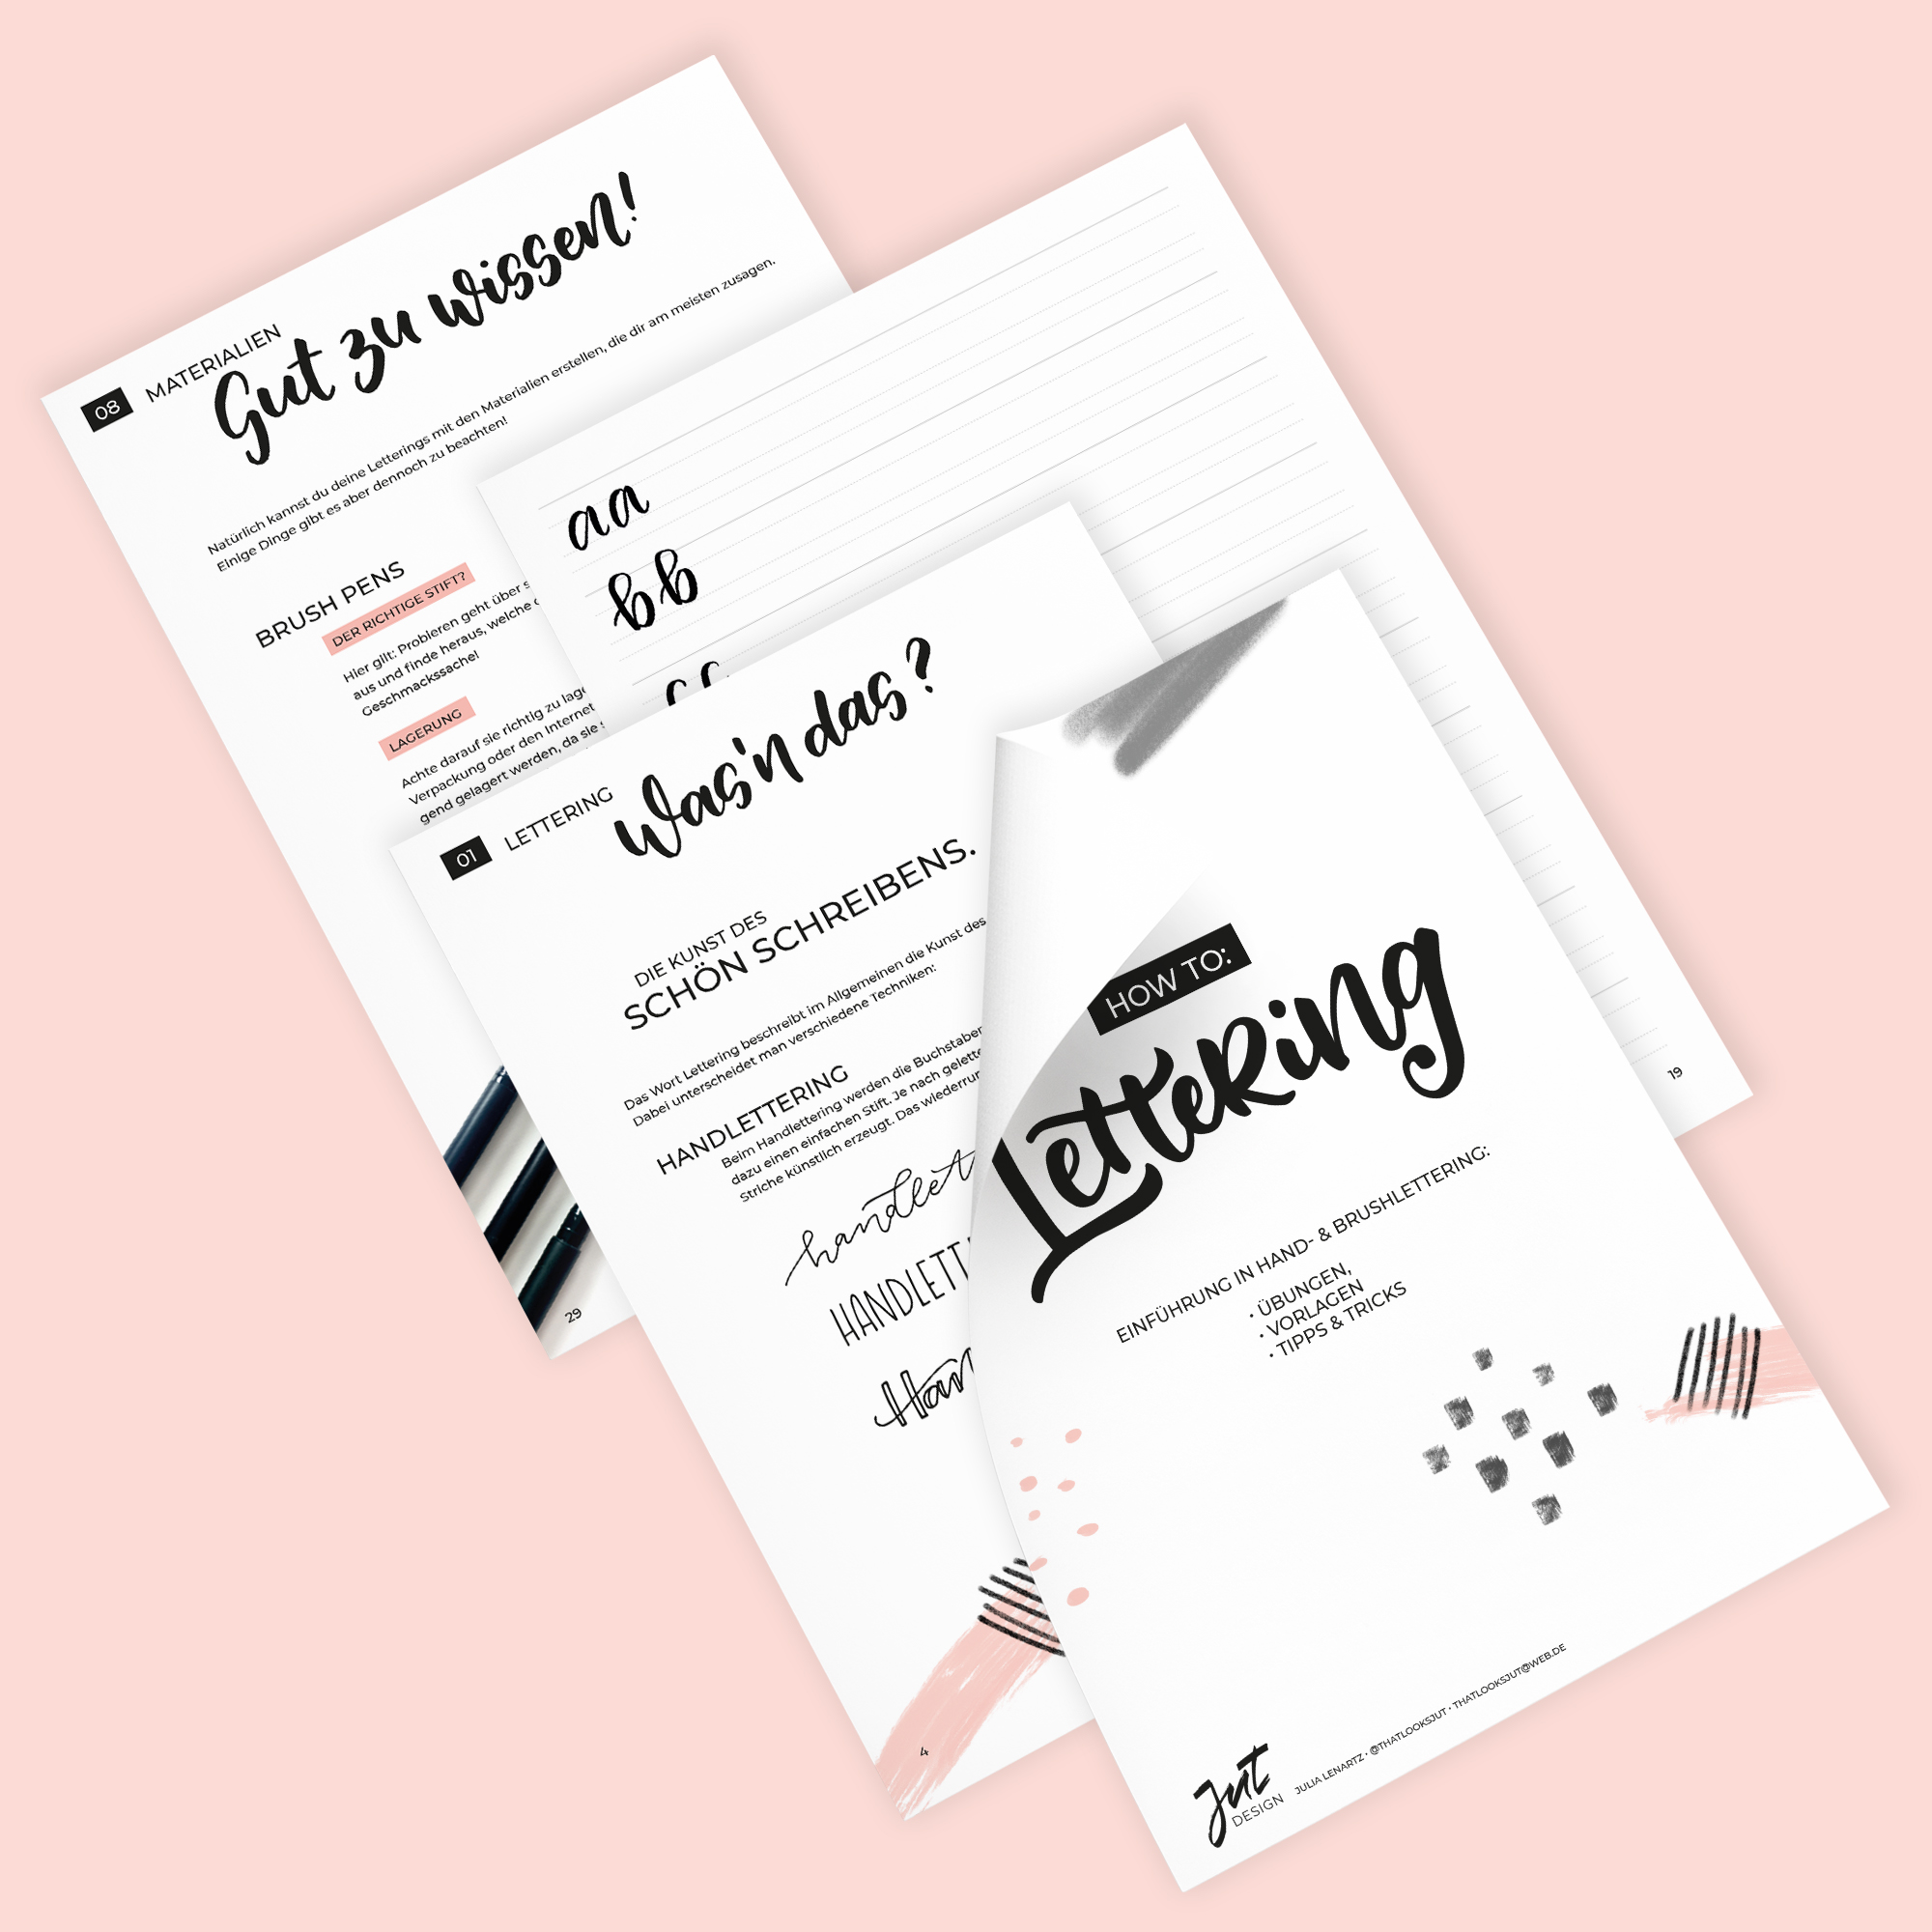 Lettering Guide von @thatlooksjut